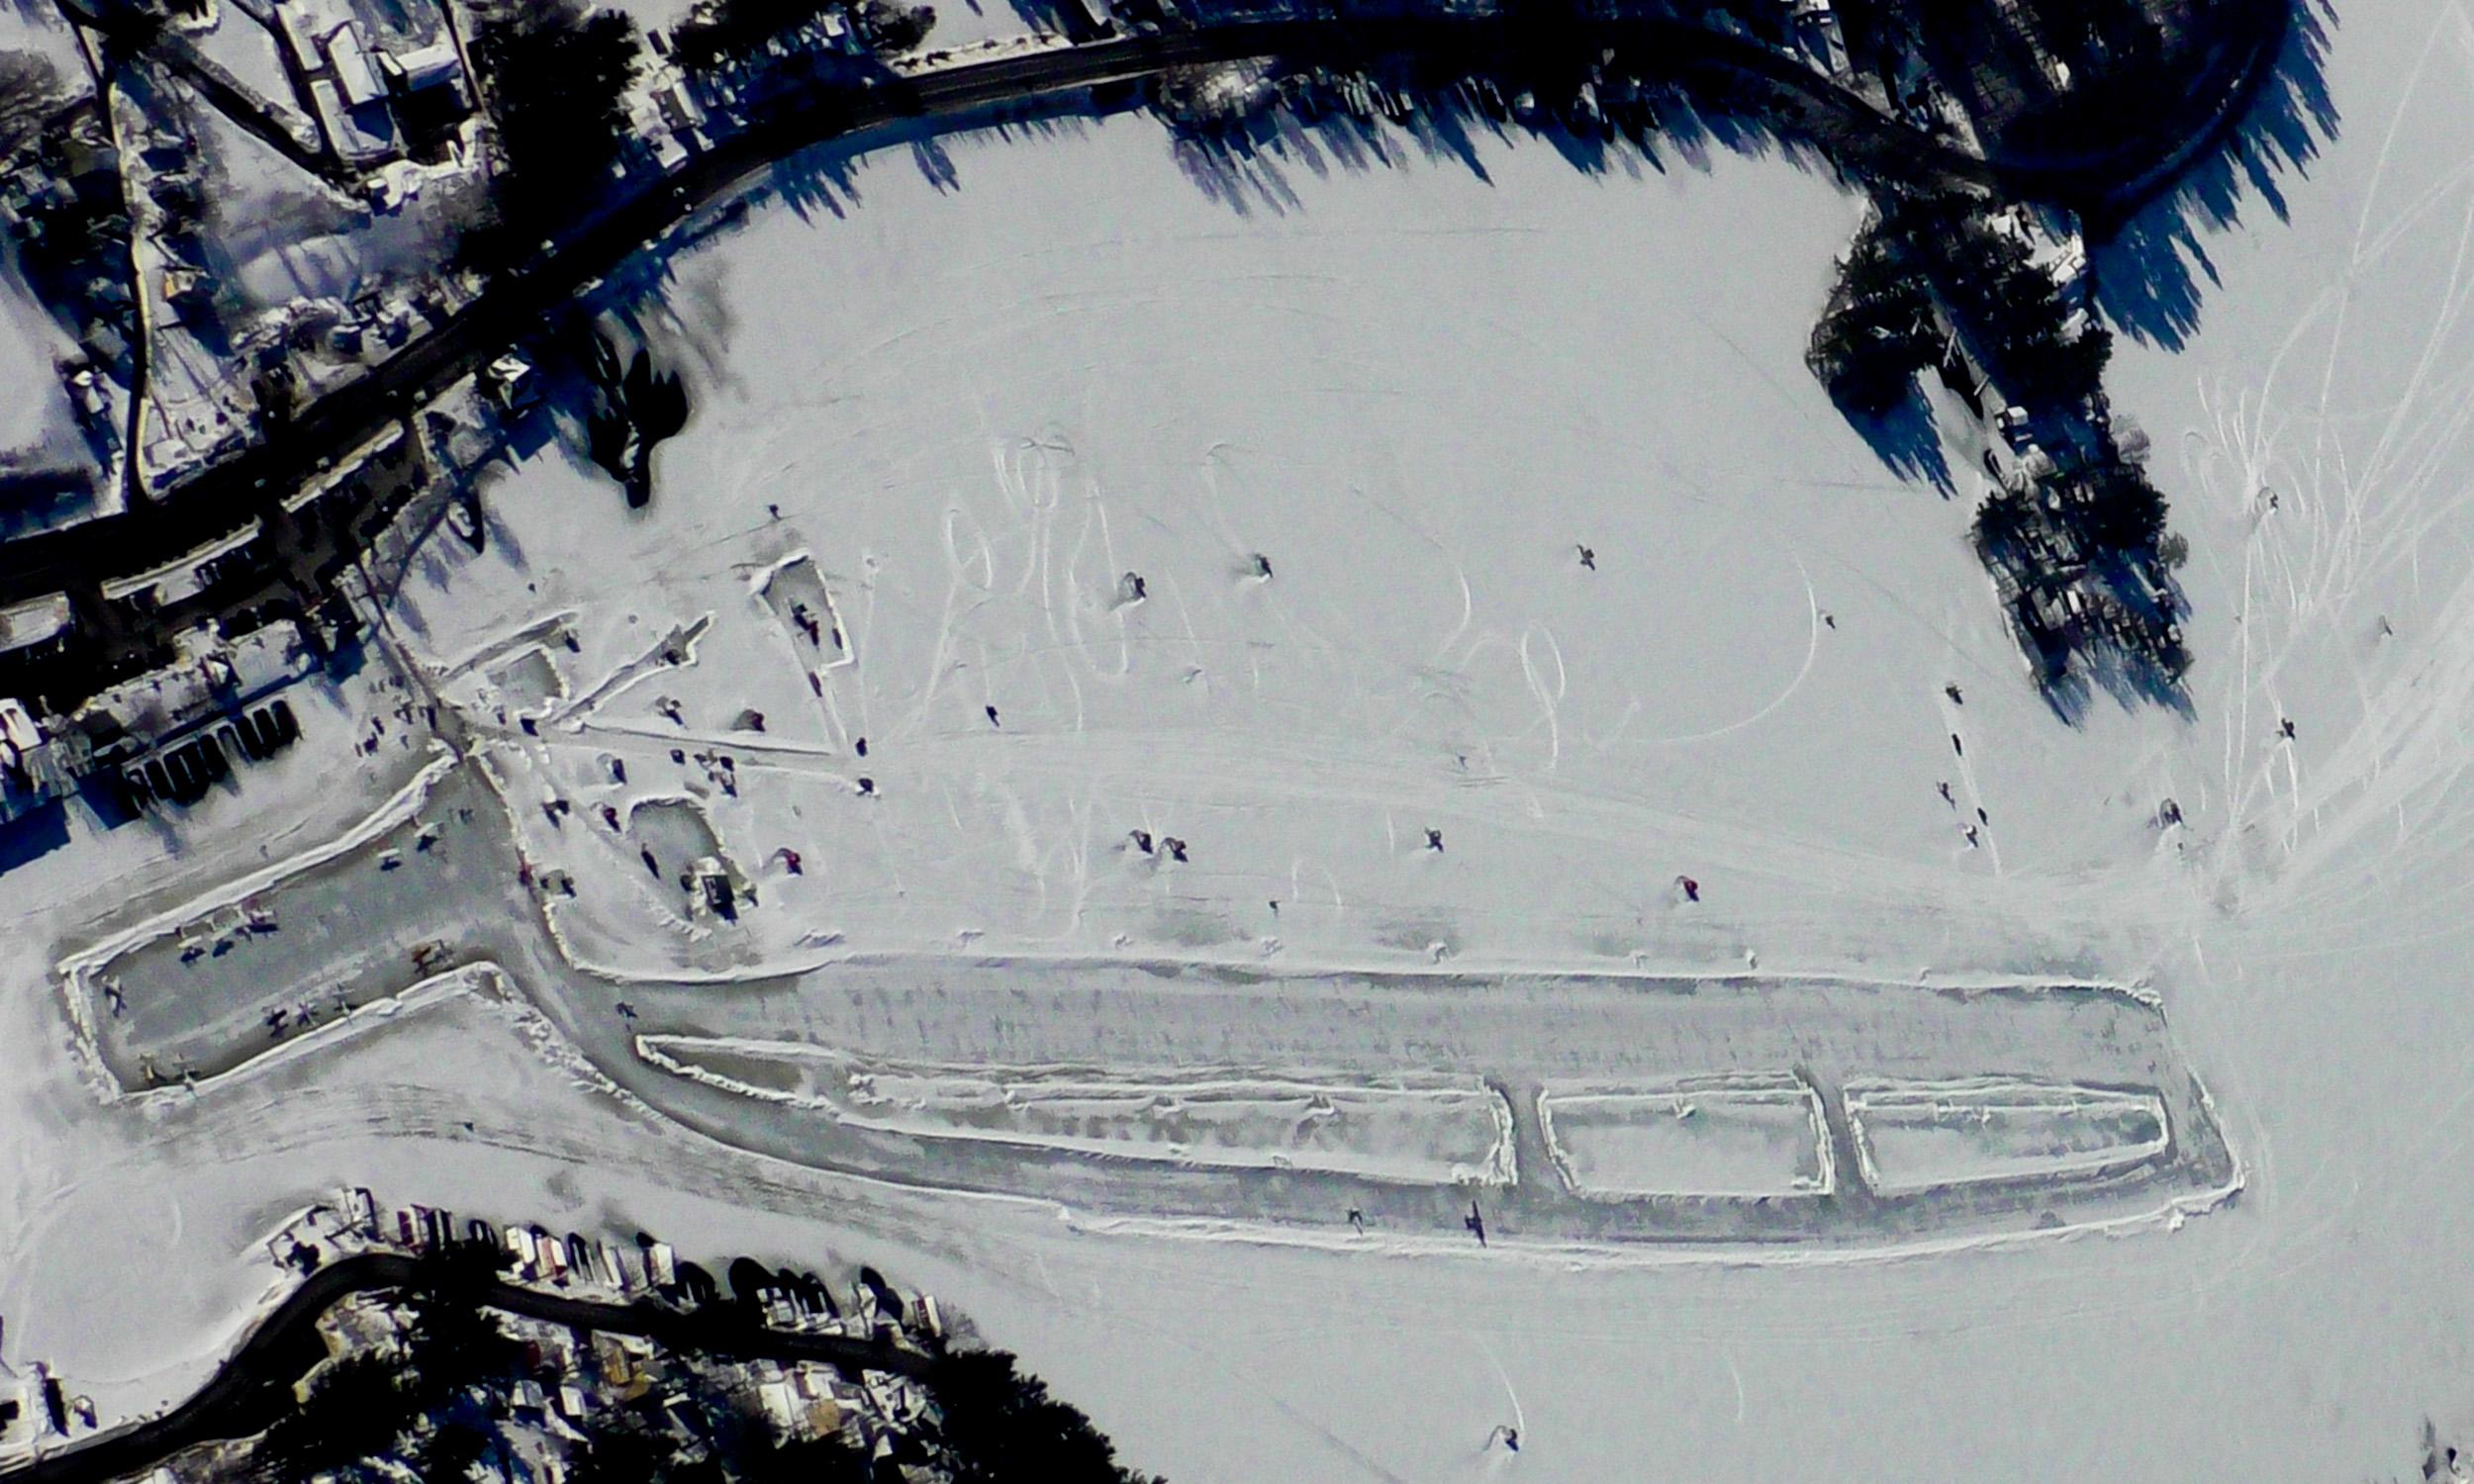 Alton_Bay_Airport_%28B18%29_in_winter.jpg